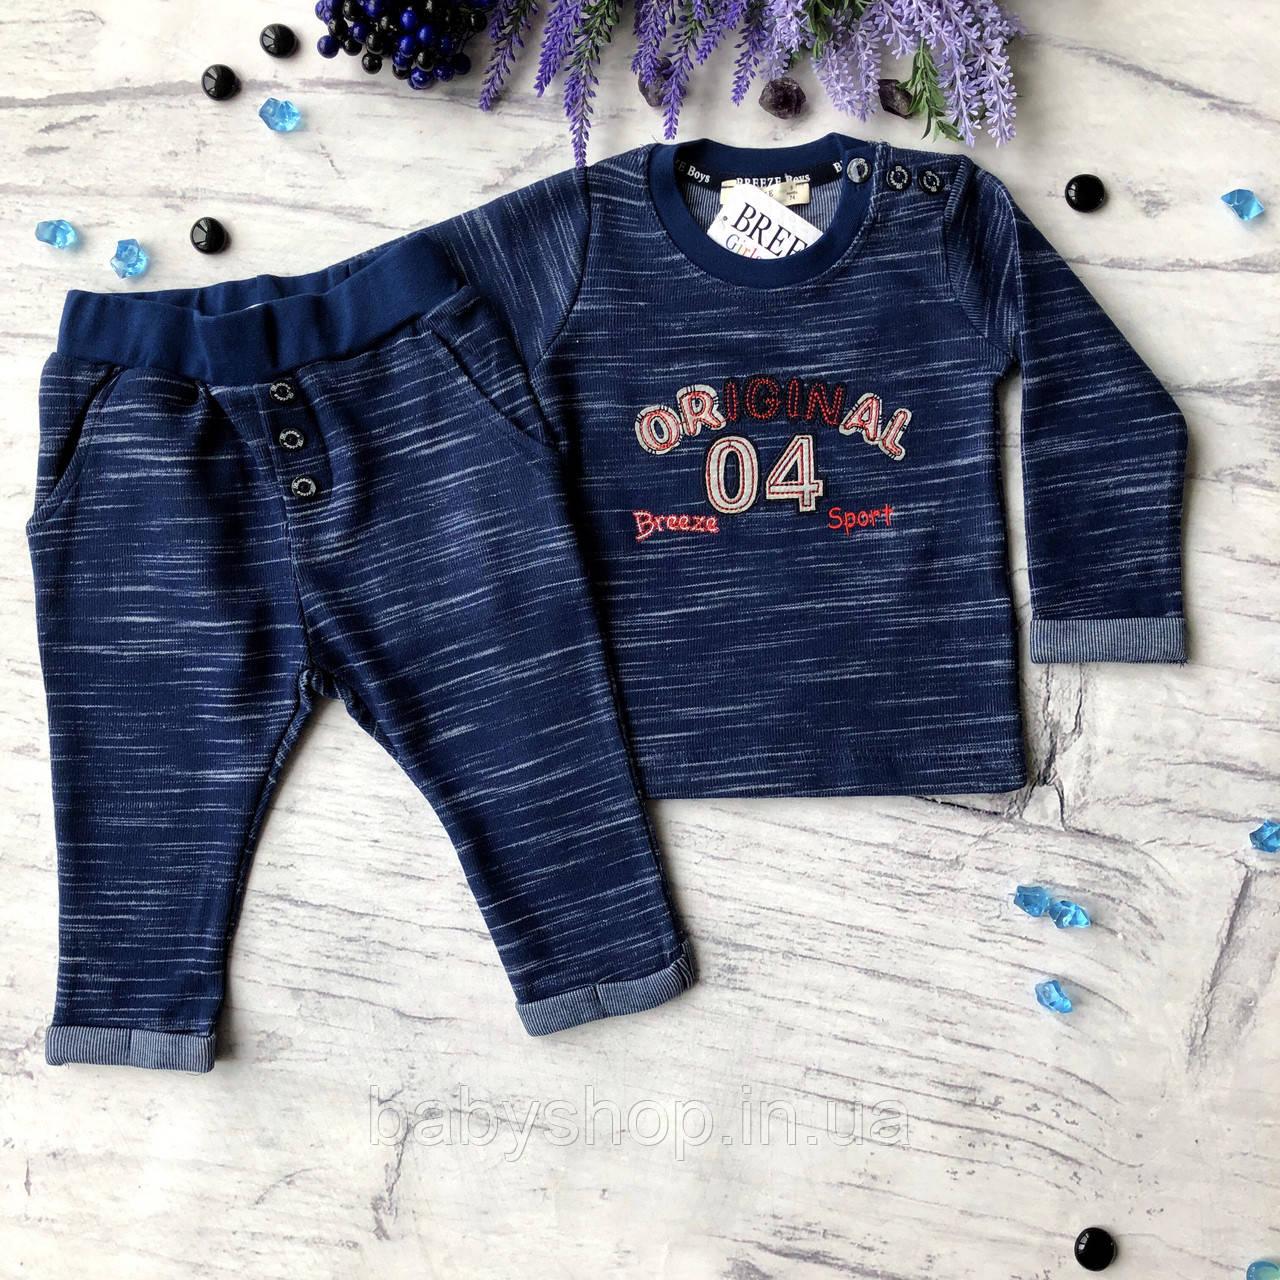 Синий костюм на мальчика Breeze 213. Размер 74 см (9мес), 80 см, 98 см (3 года)